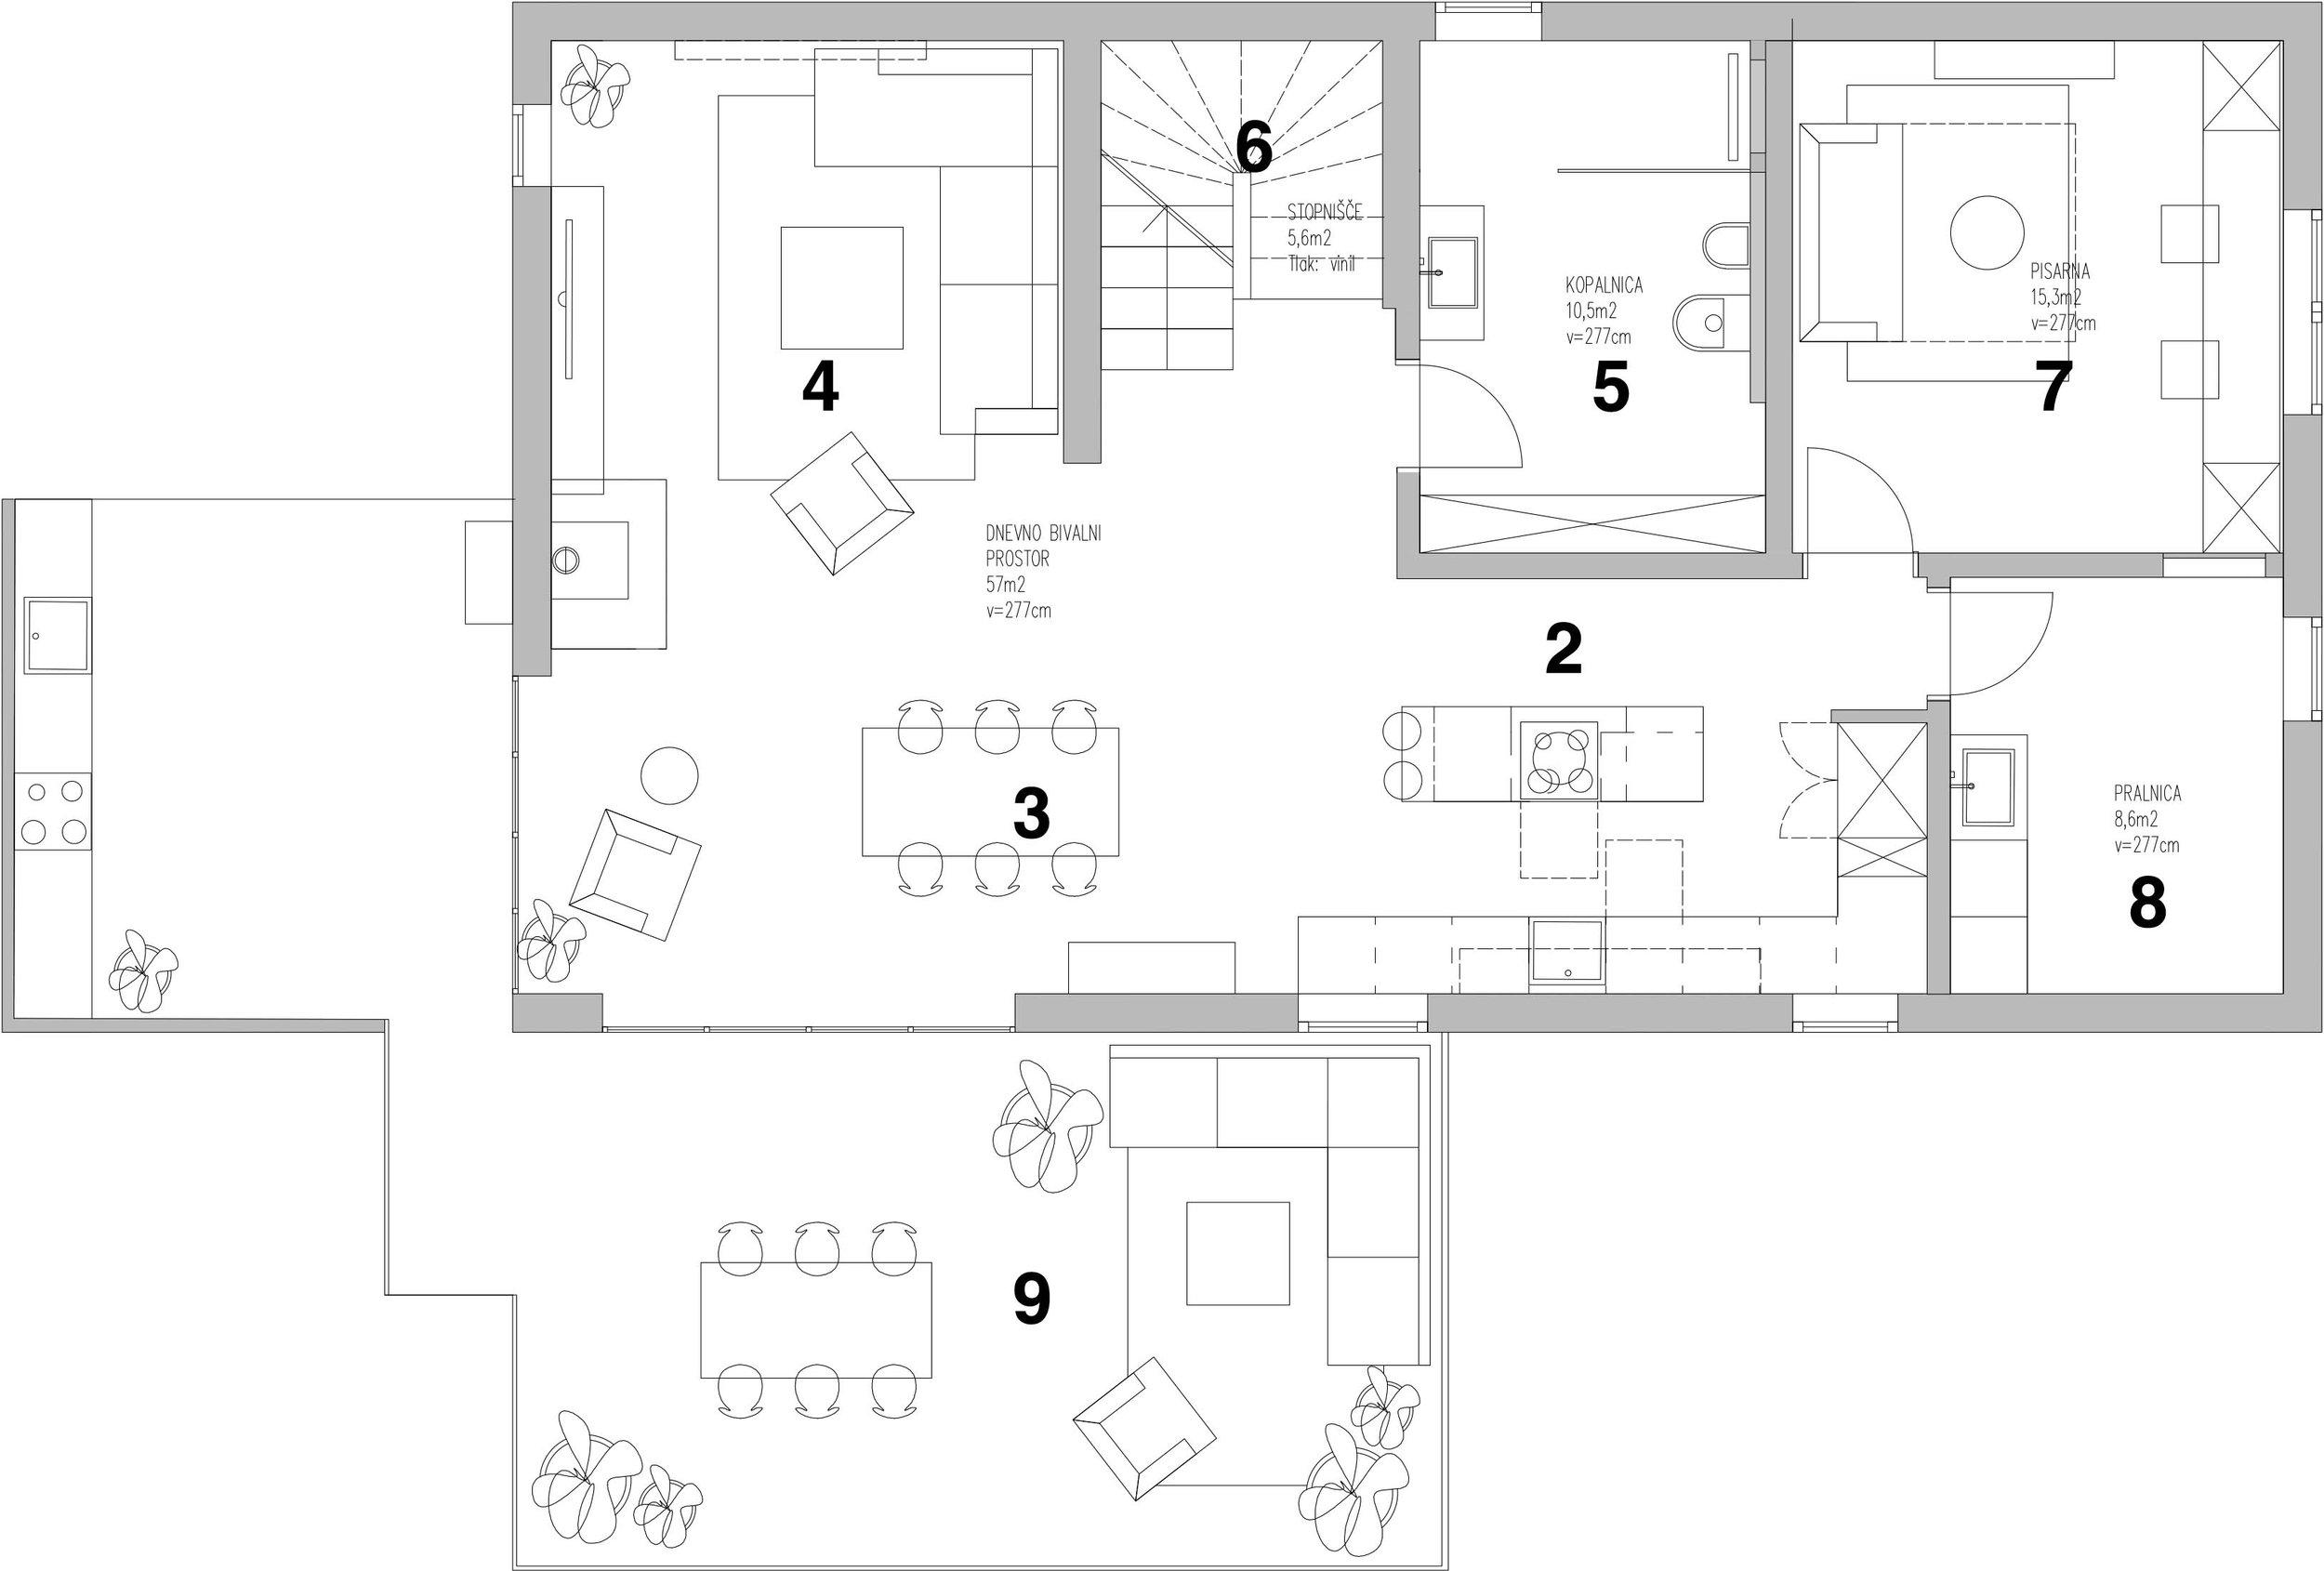 First floor - 2. Kitchen3. Dinning room4. Living room5. Bathroom 16. Stairway7. Office8. Utility9. Terrace